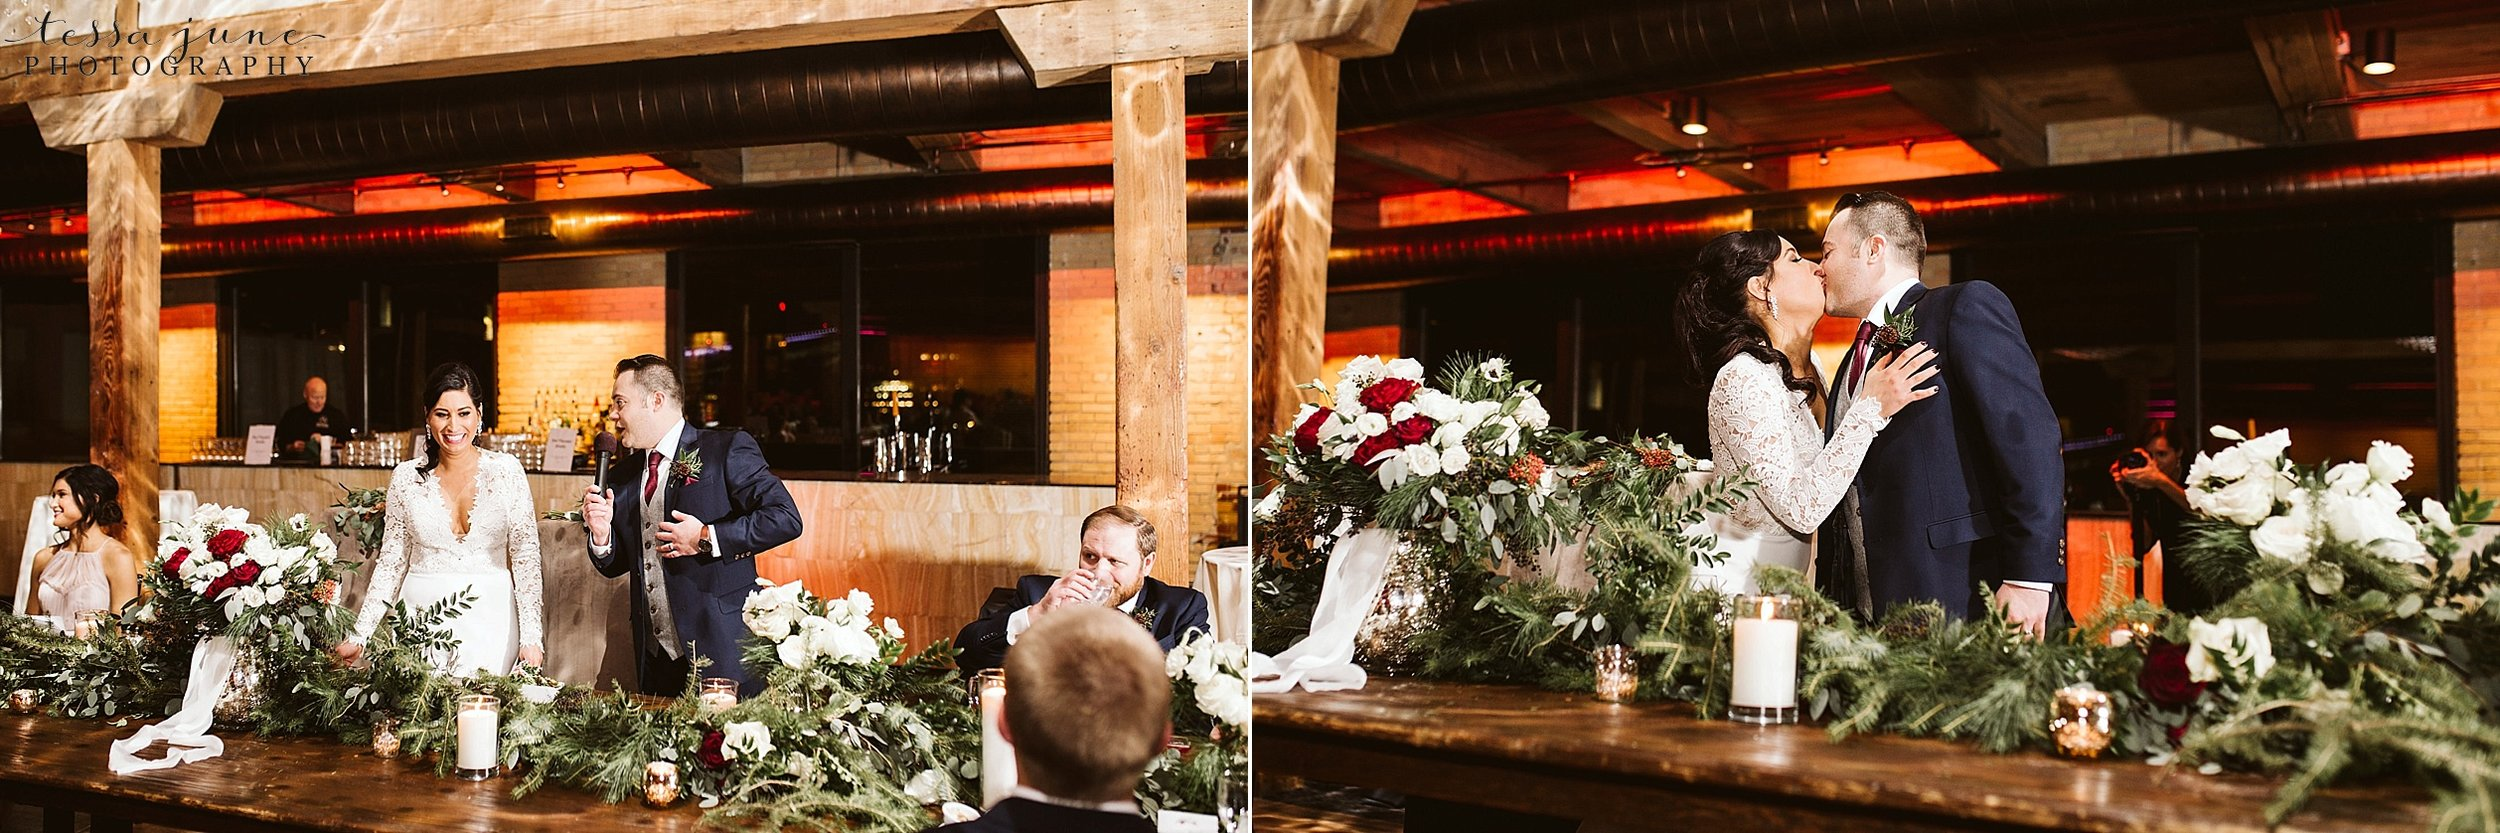 minneapolis-event-center-winter-romantic-snow-wedding-december-178.jpg